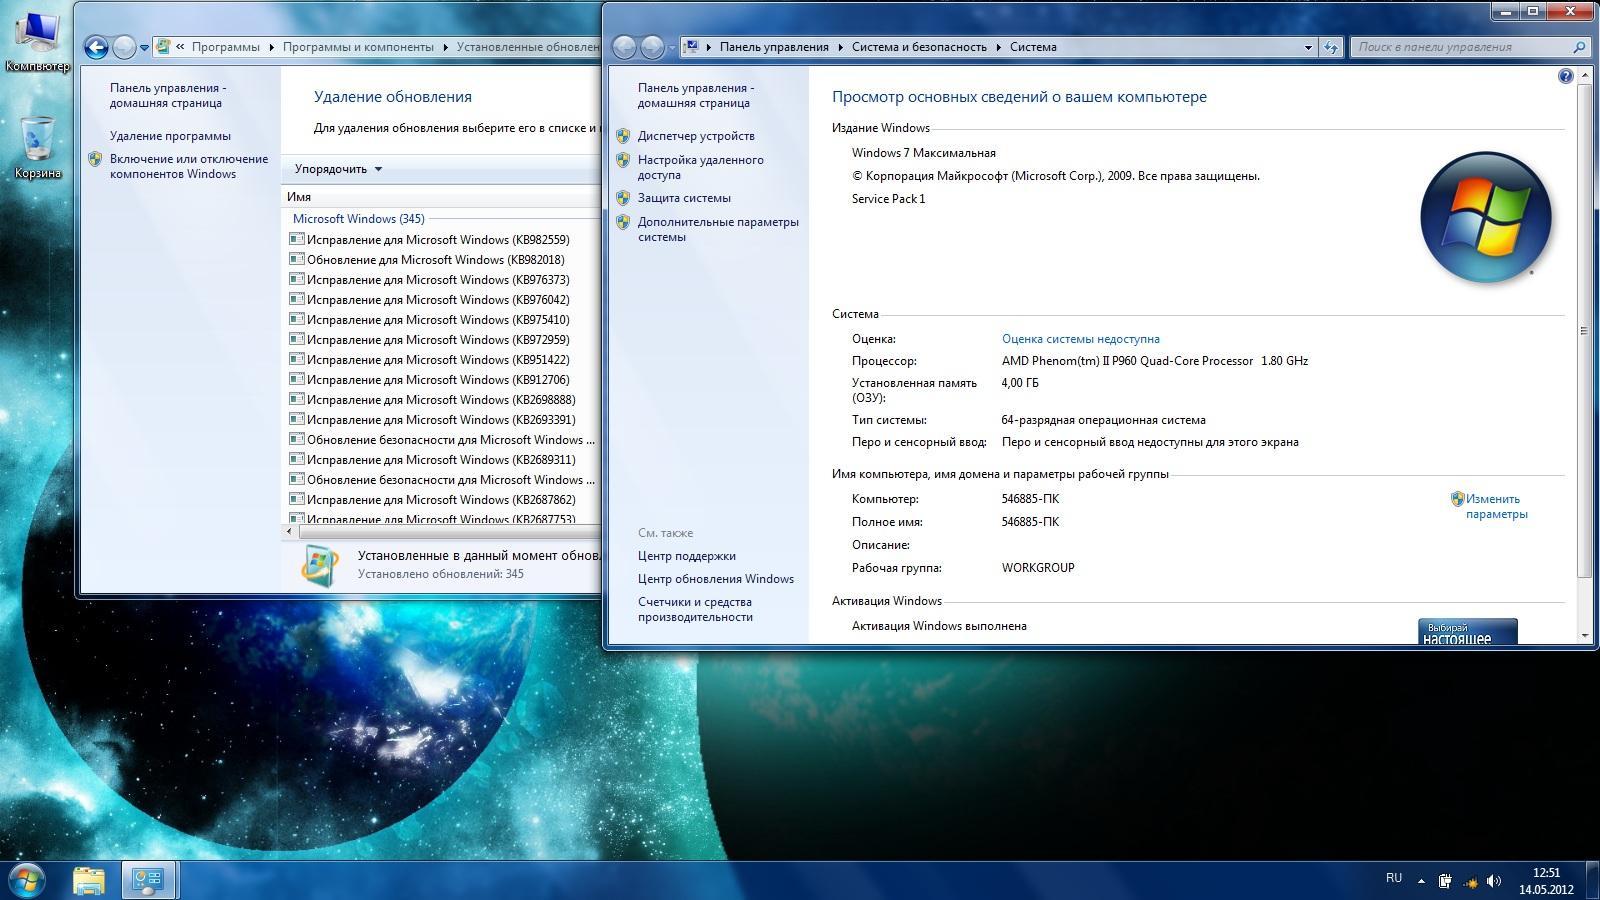 активатор windows 7 ключом бесплатно